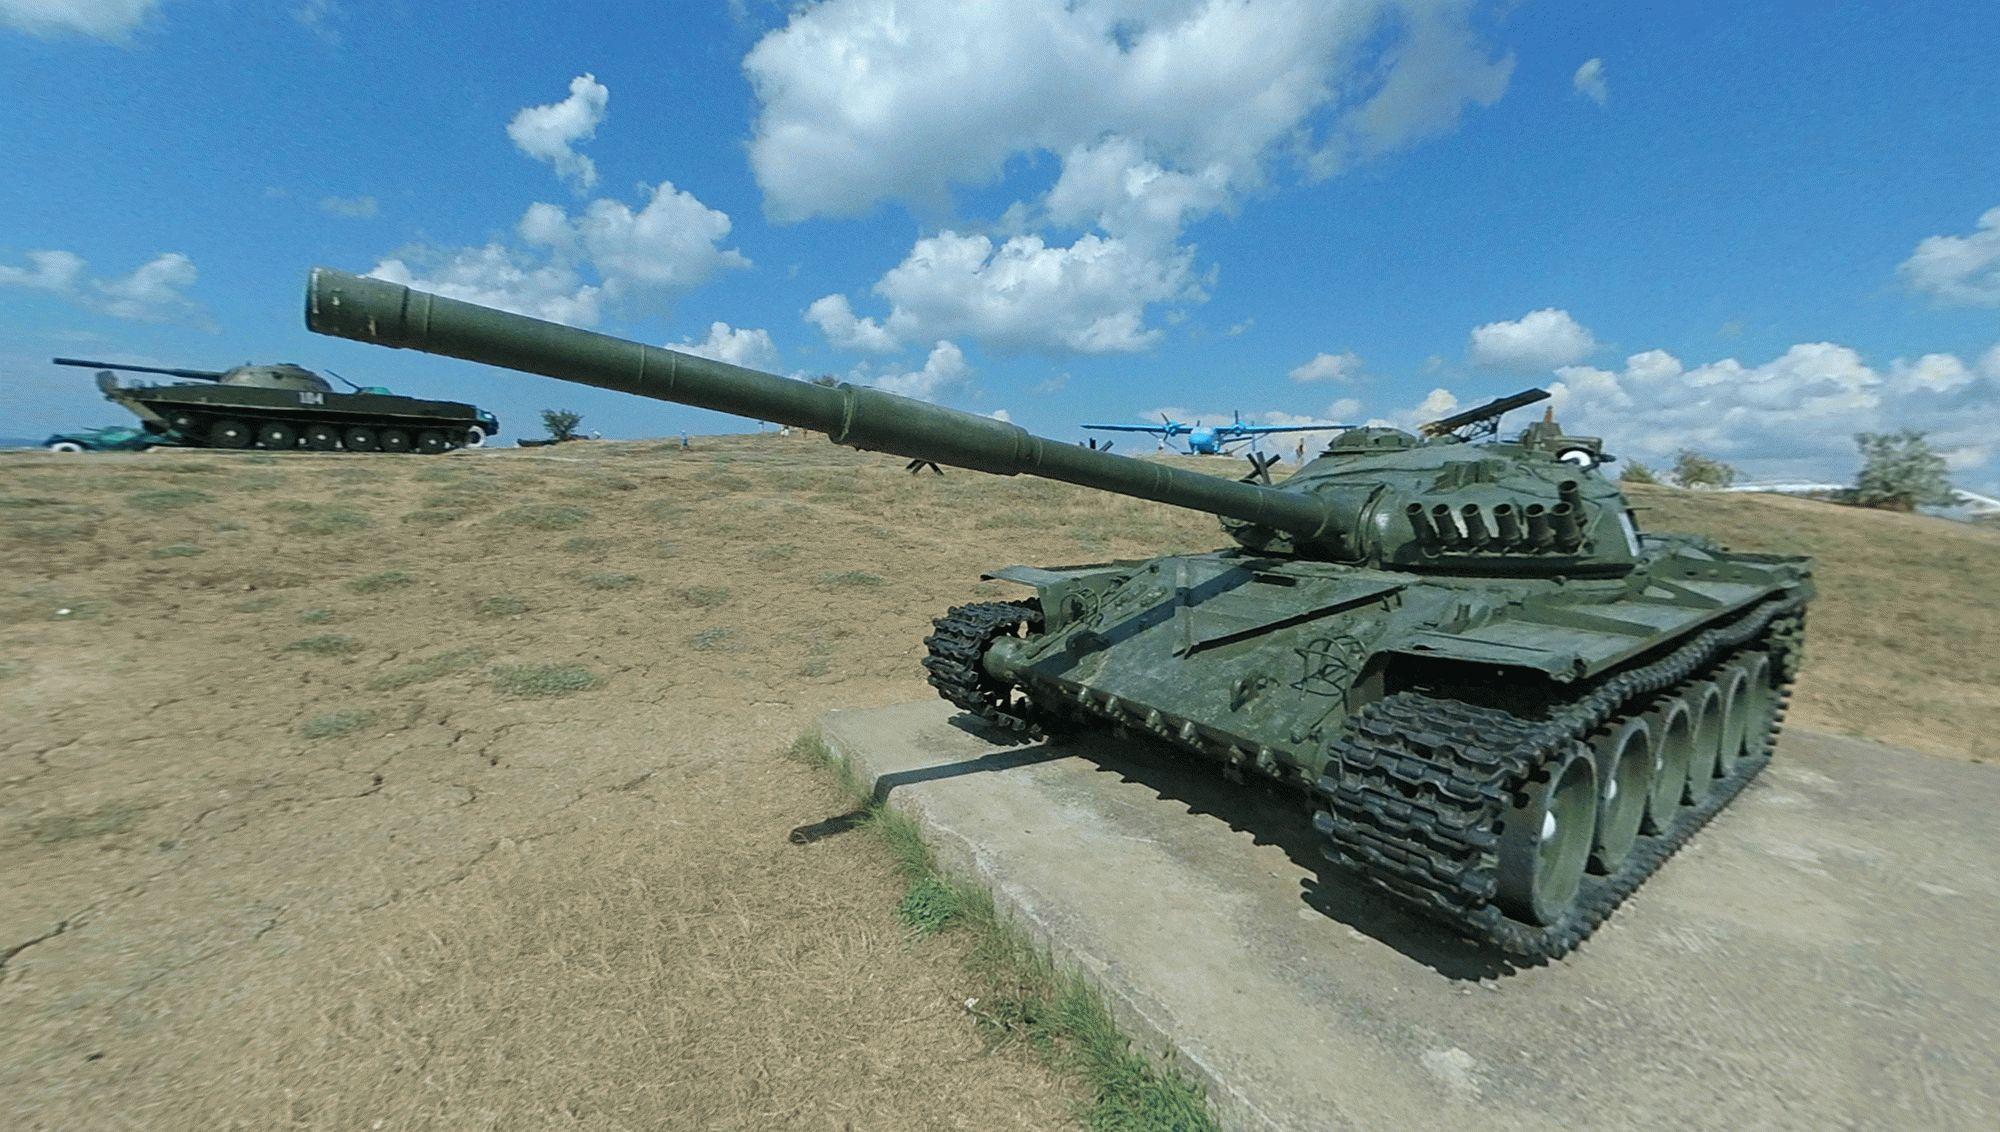 Боевые экспонаты